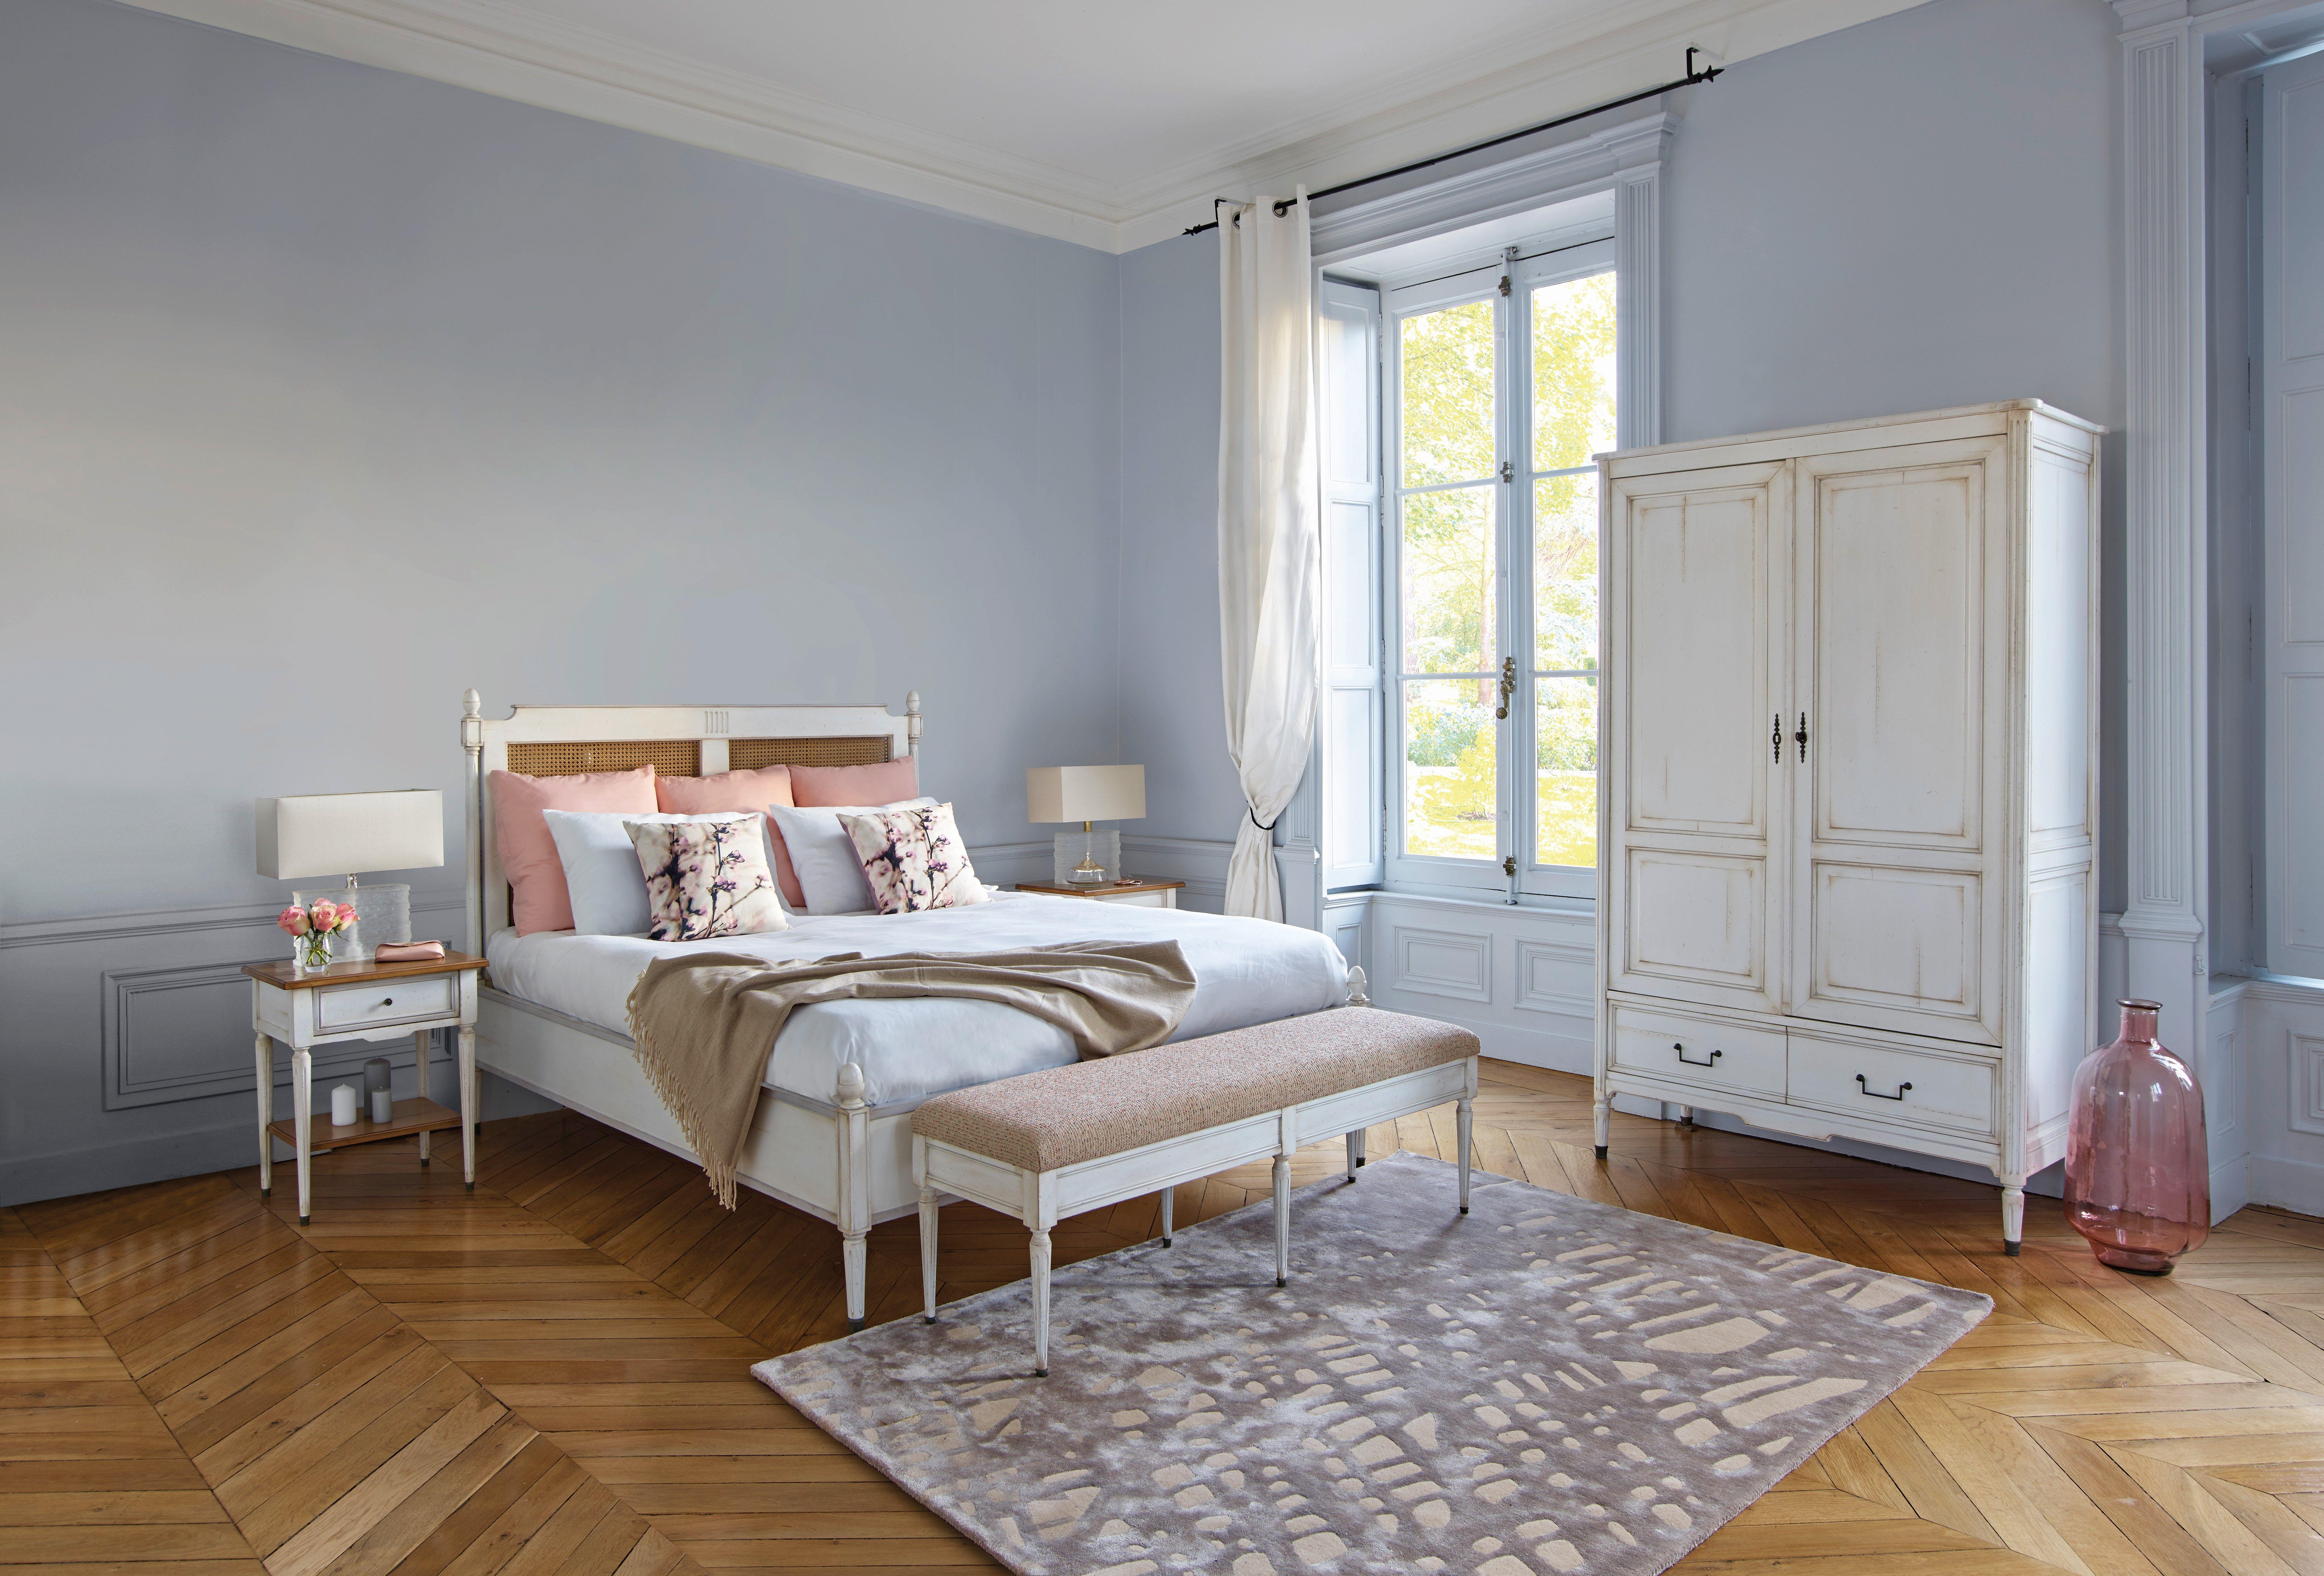 slaapkamer ideen zacht roze slaapkamer pink bedroom klassieke slaapkamer moderne slaapkamer slaapkamer ideen wit houten bed classic